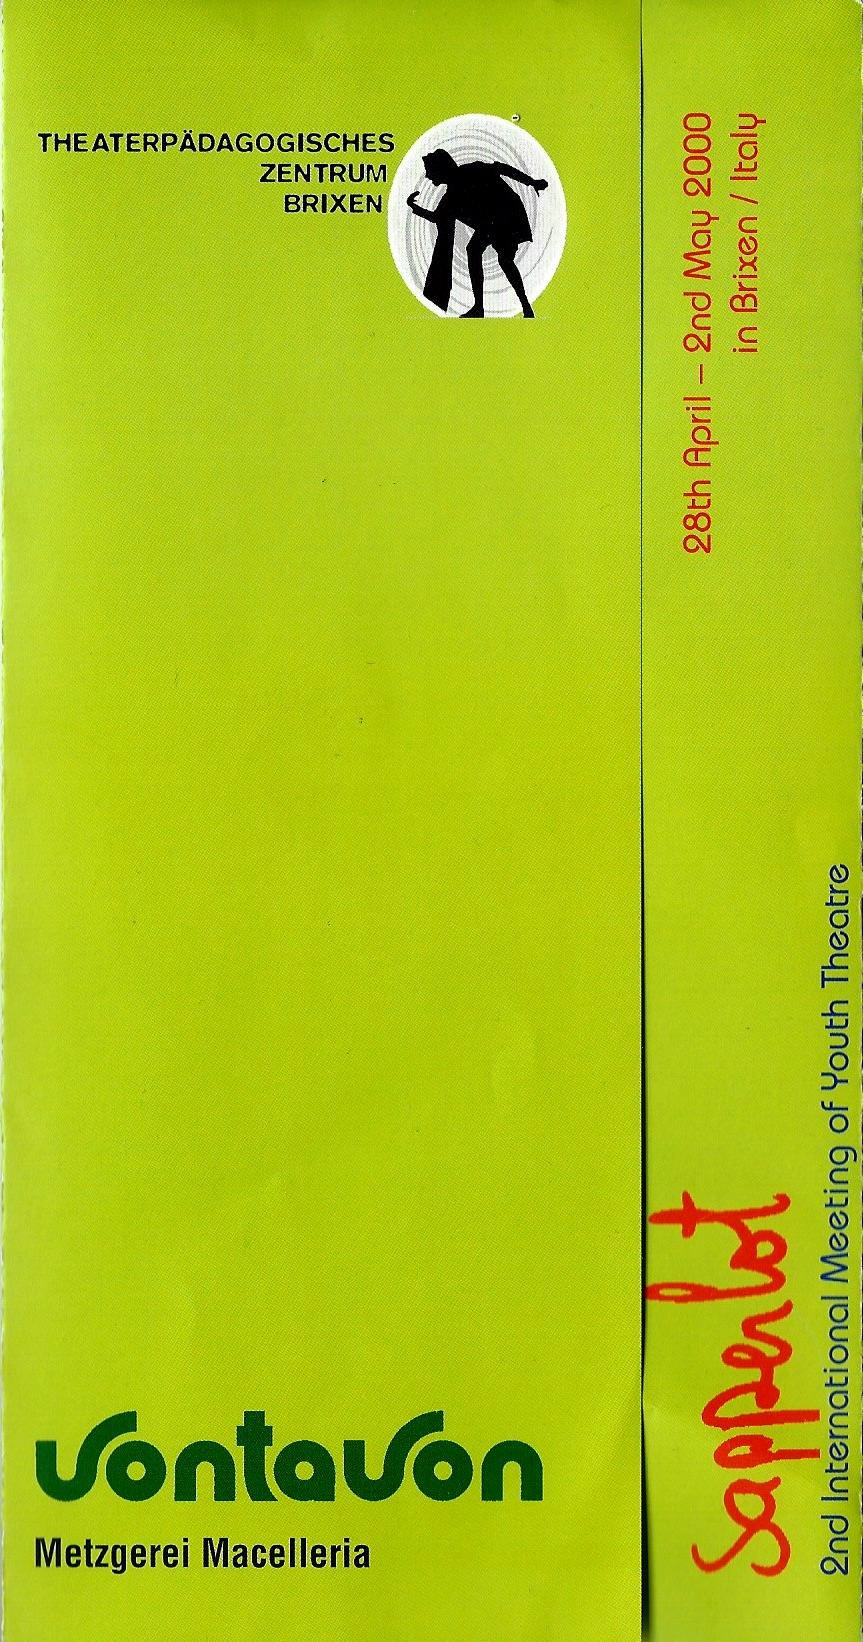 2000 sapperlot Plakat.jpg